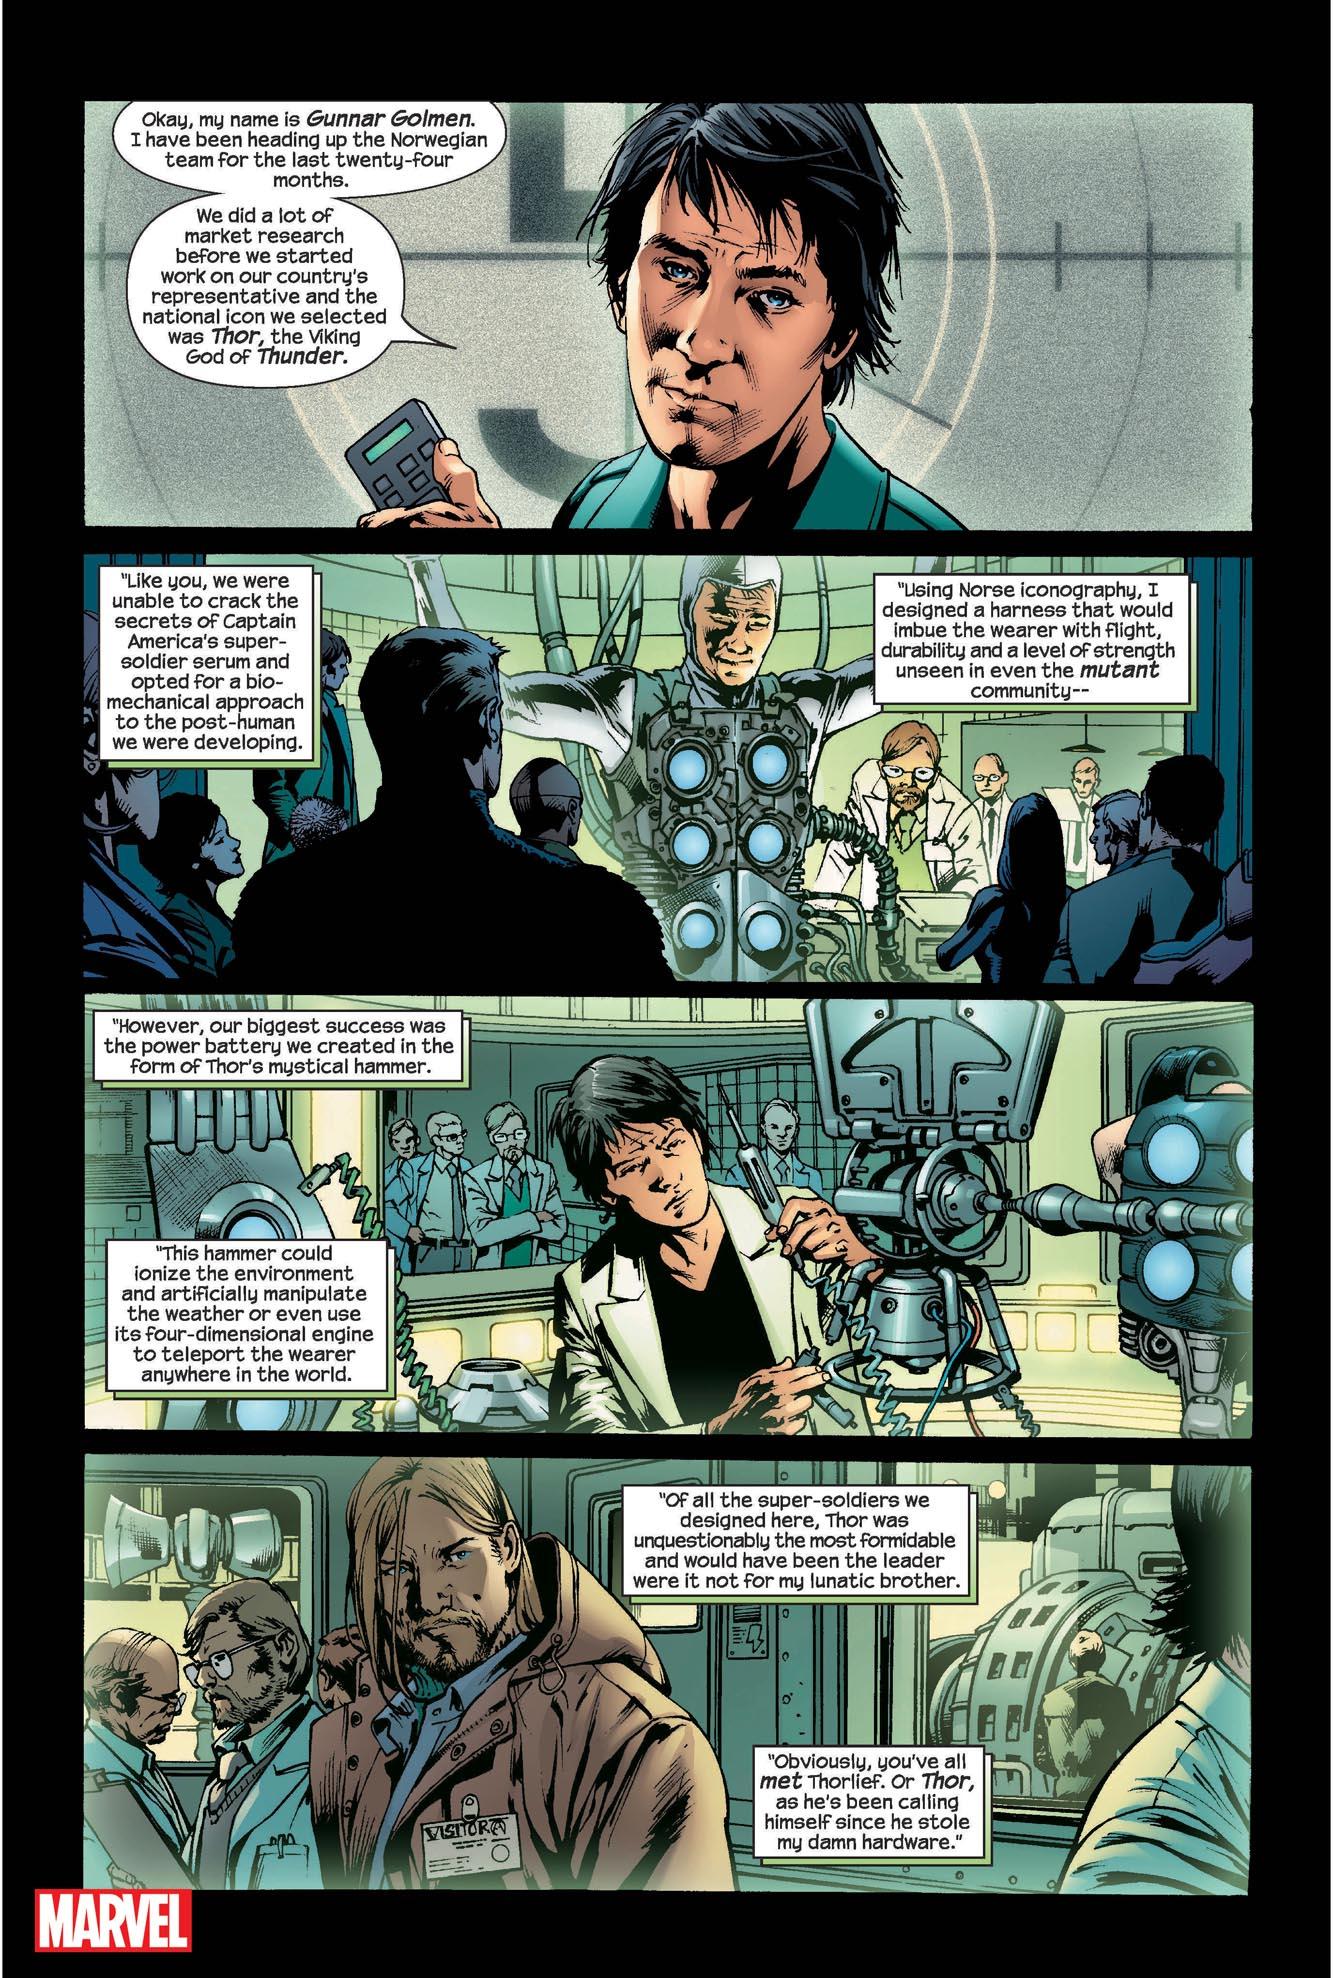 Loki comics